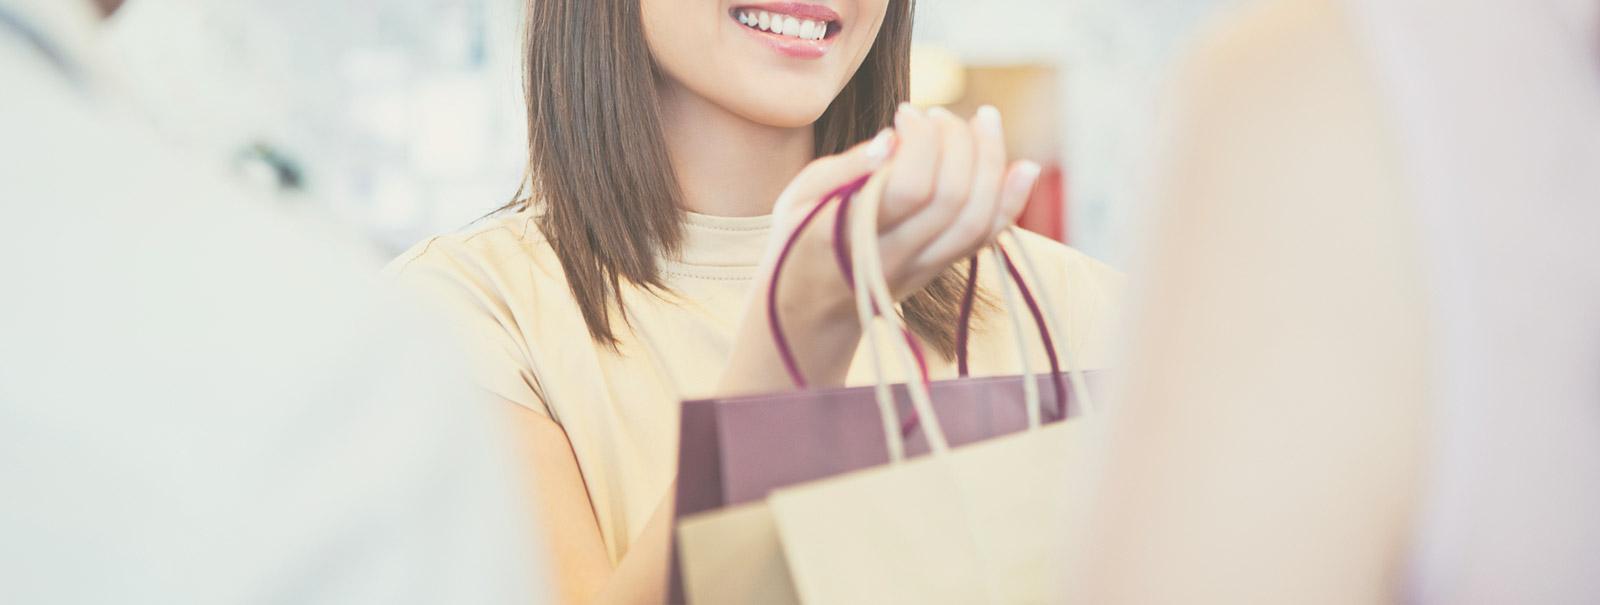 vendere moda online